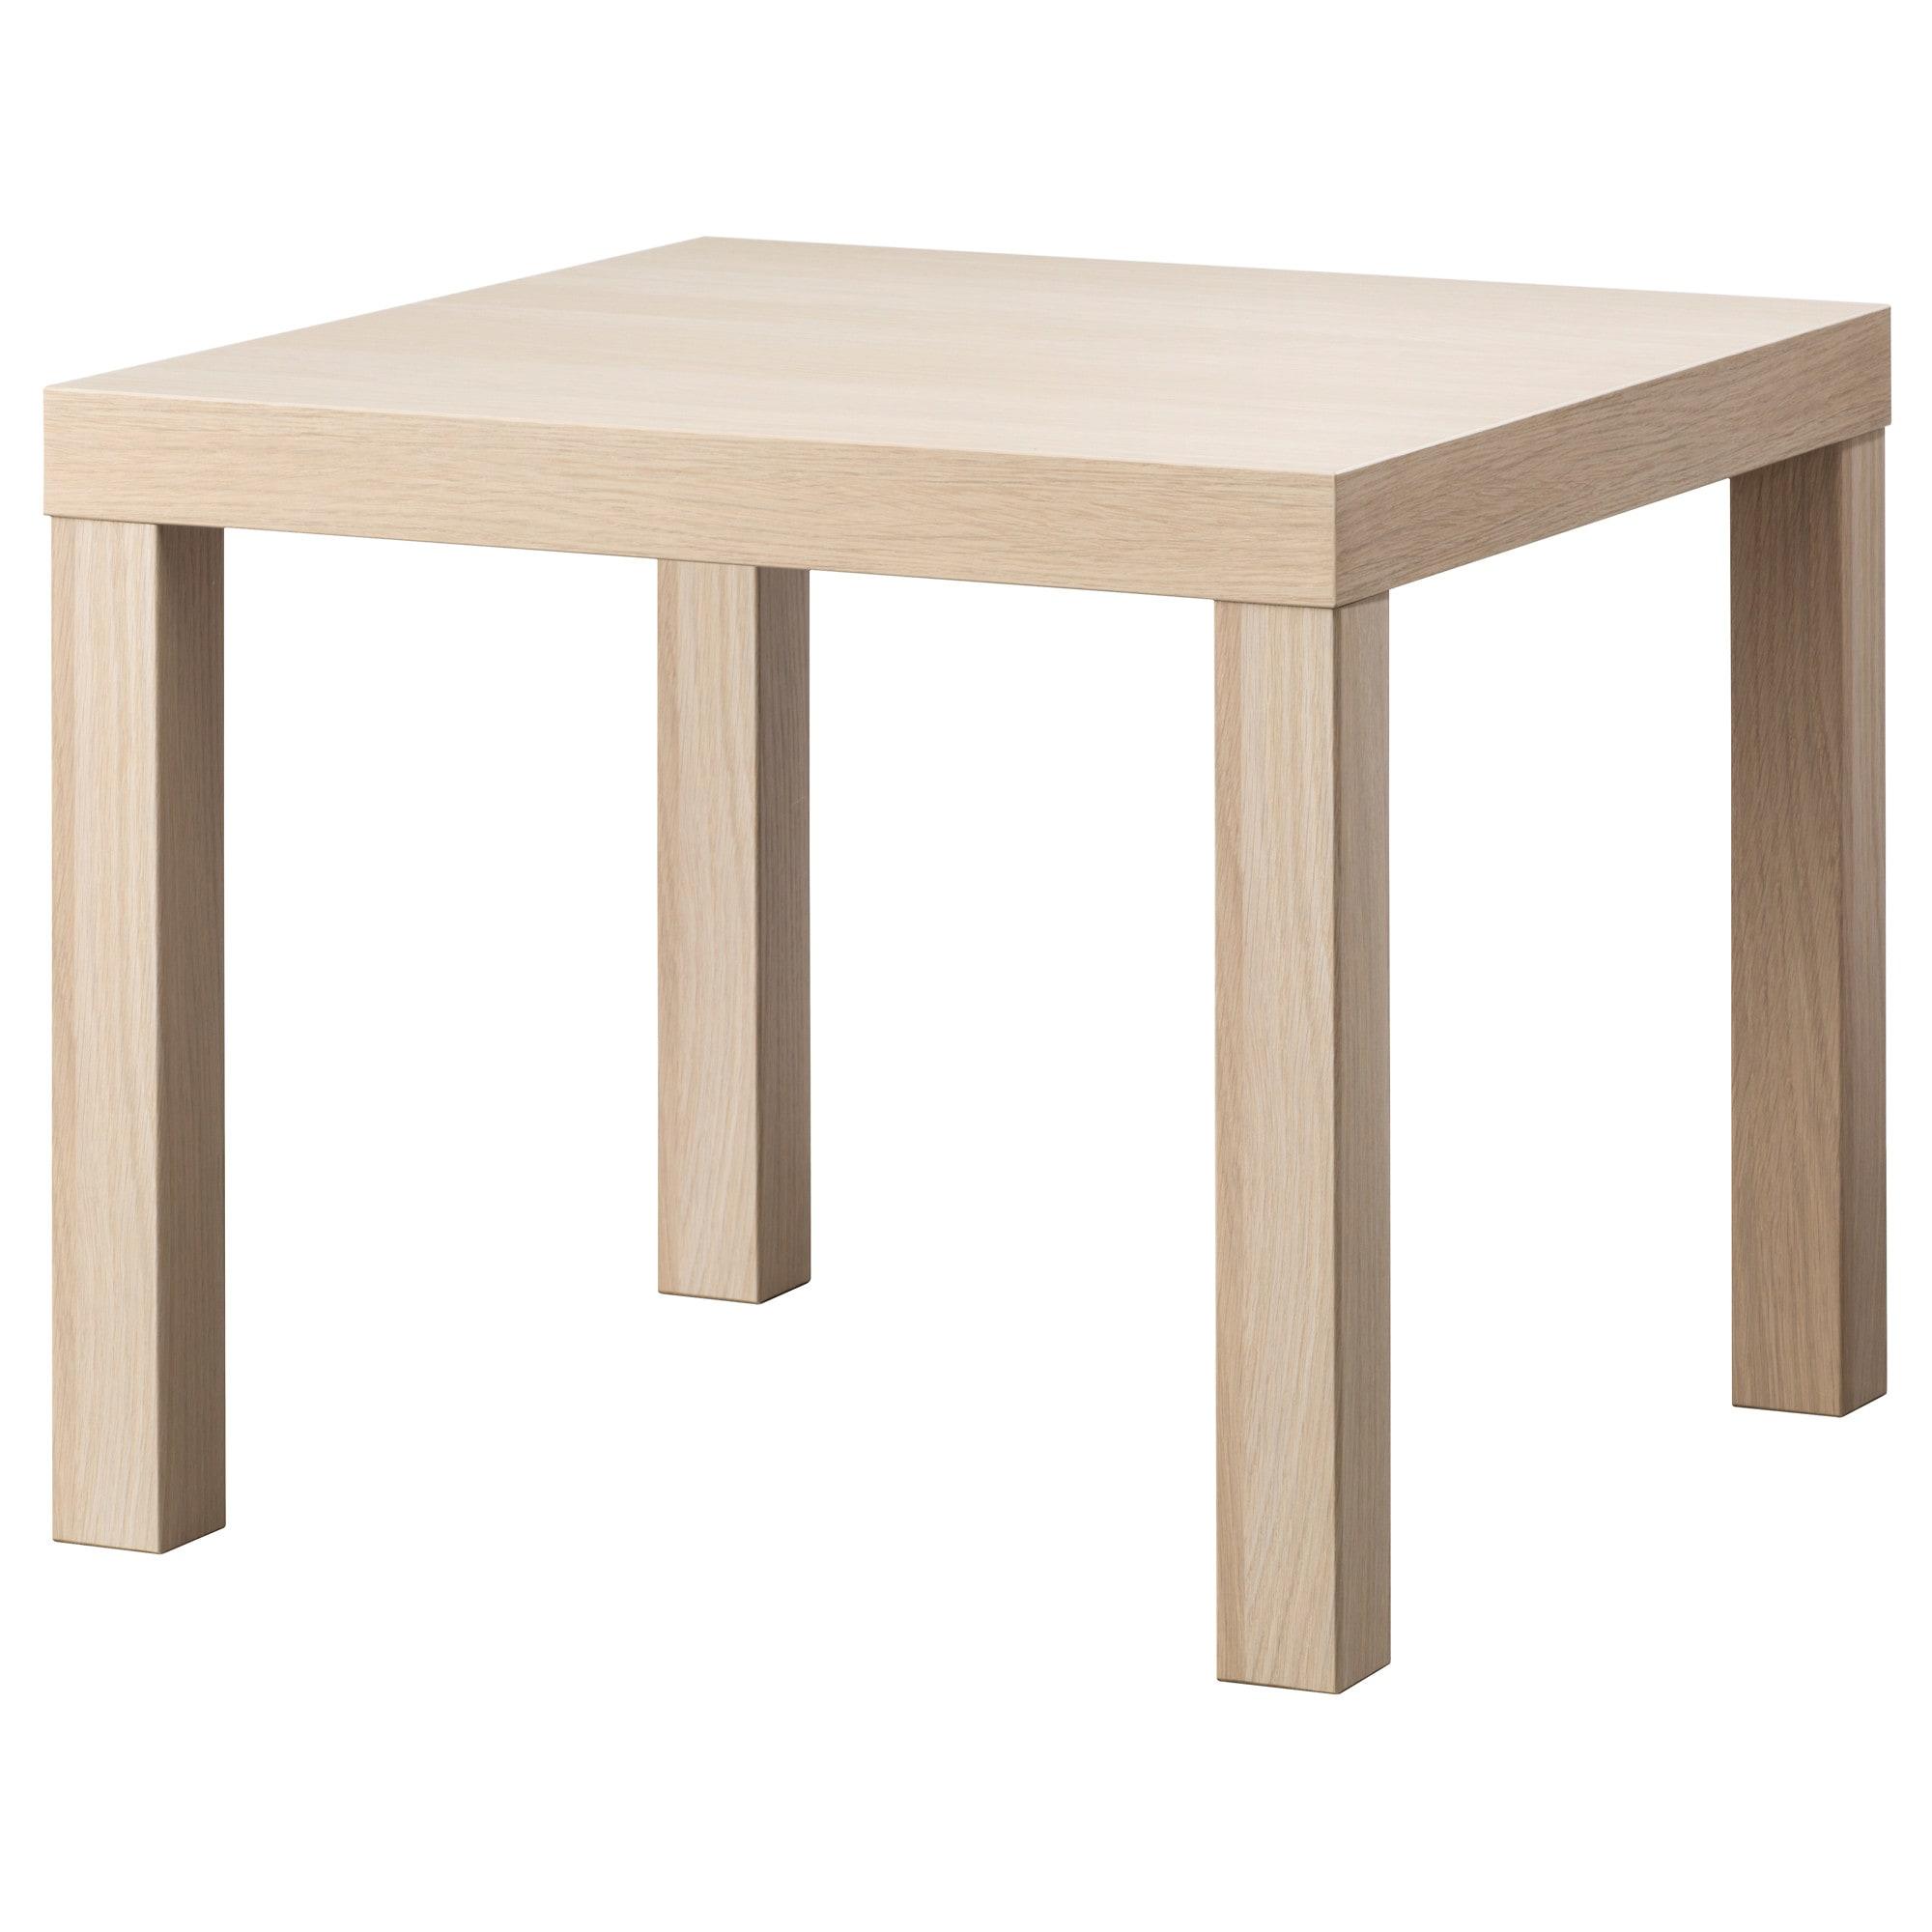 Lack Stolik Bialy Dab Bejcowany Na Bialo 55x55 Cm Ikea Pomysly Ikea Stolik